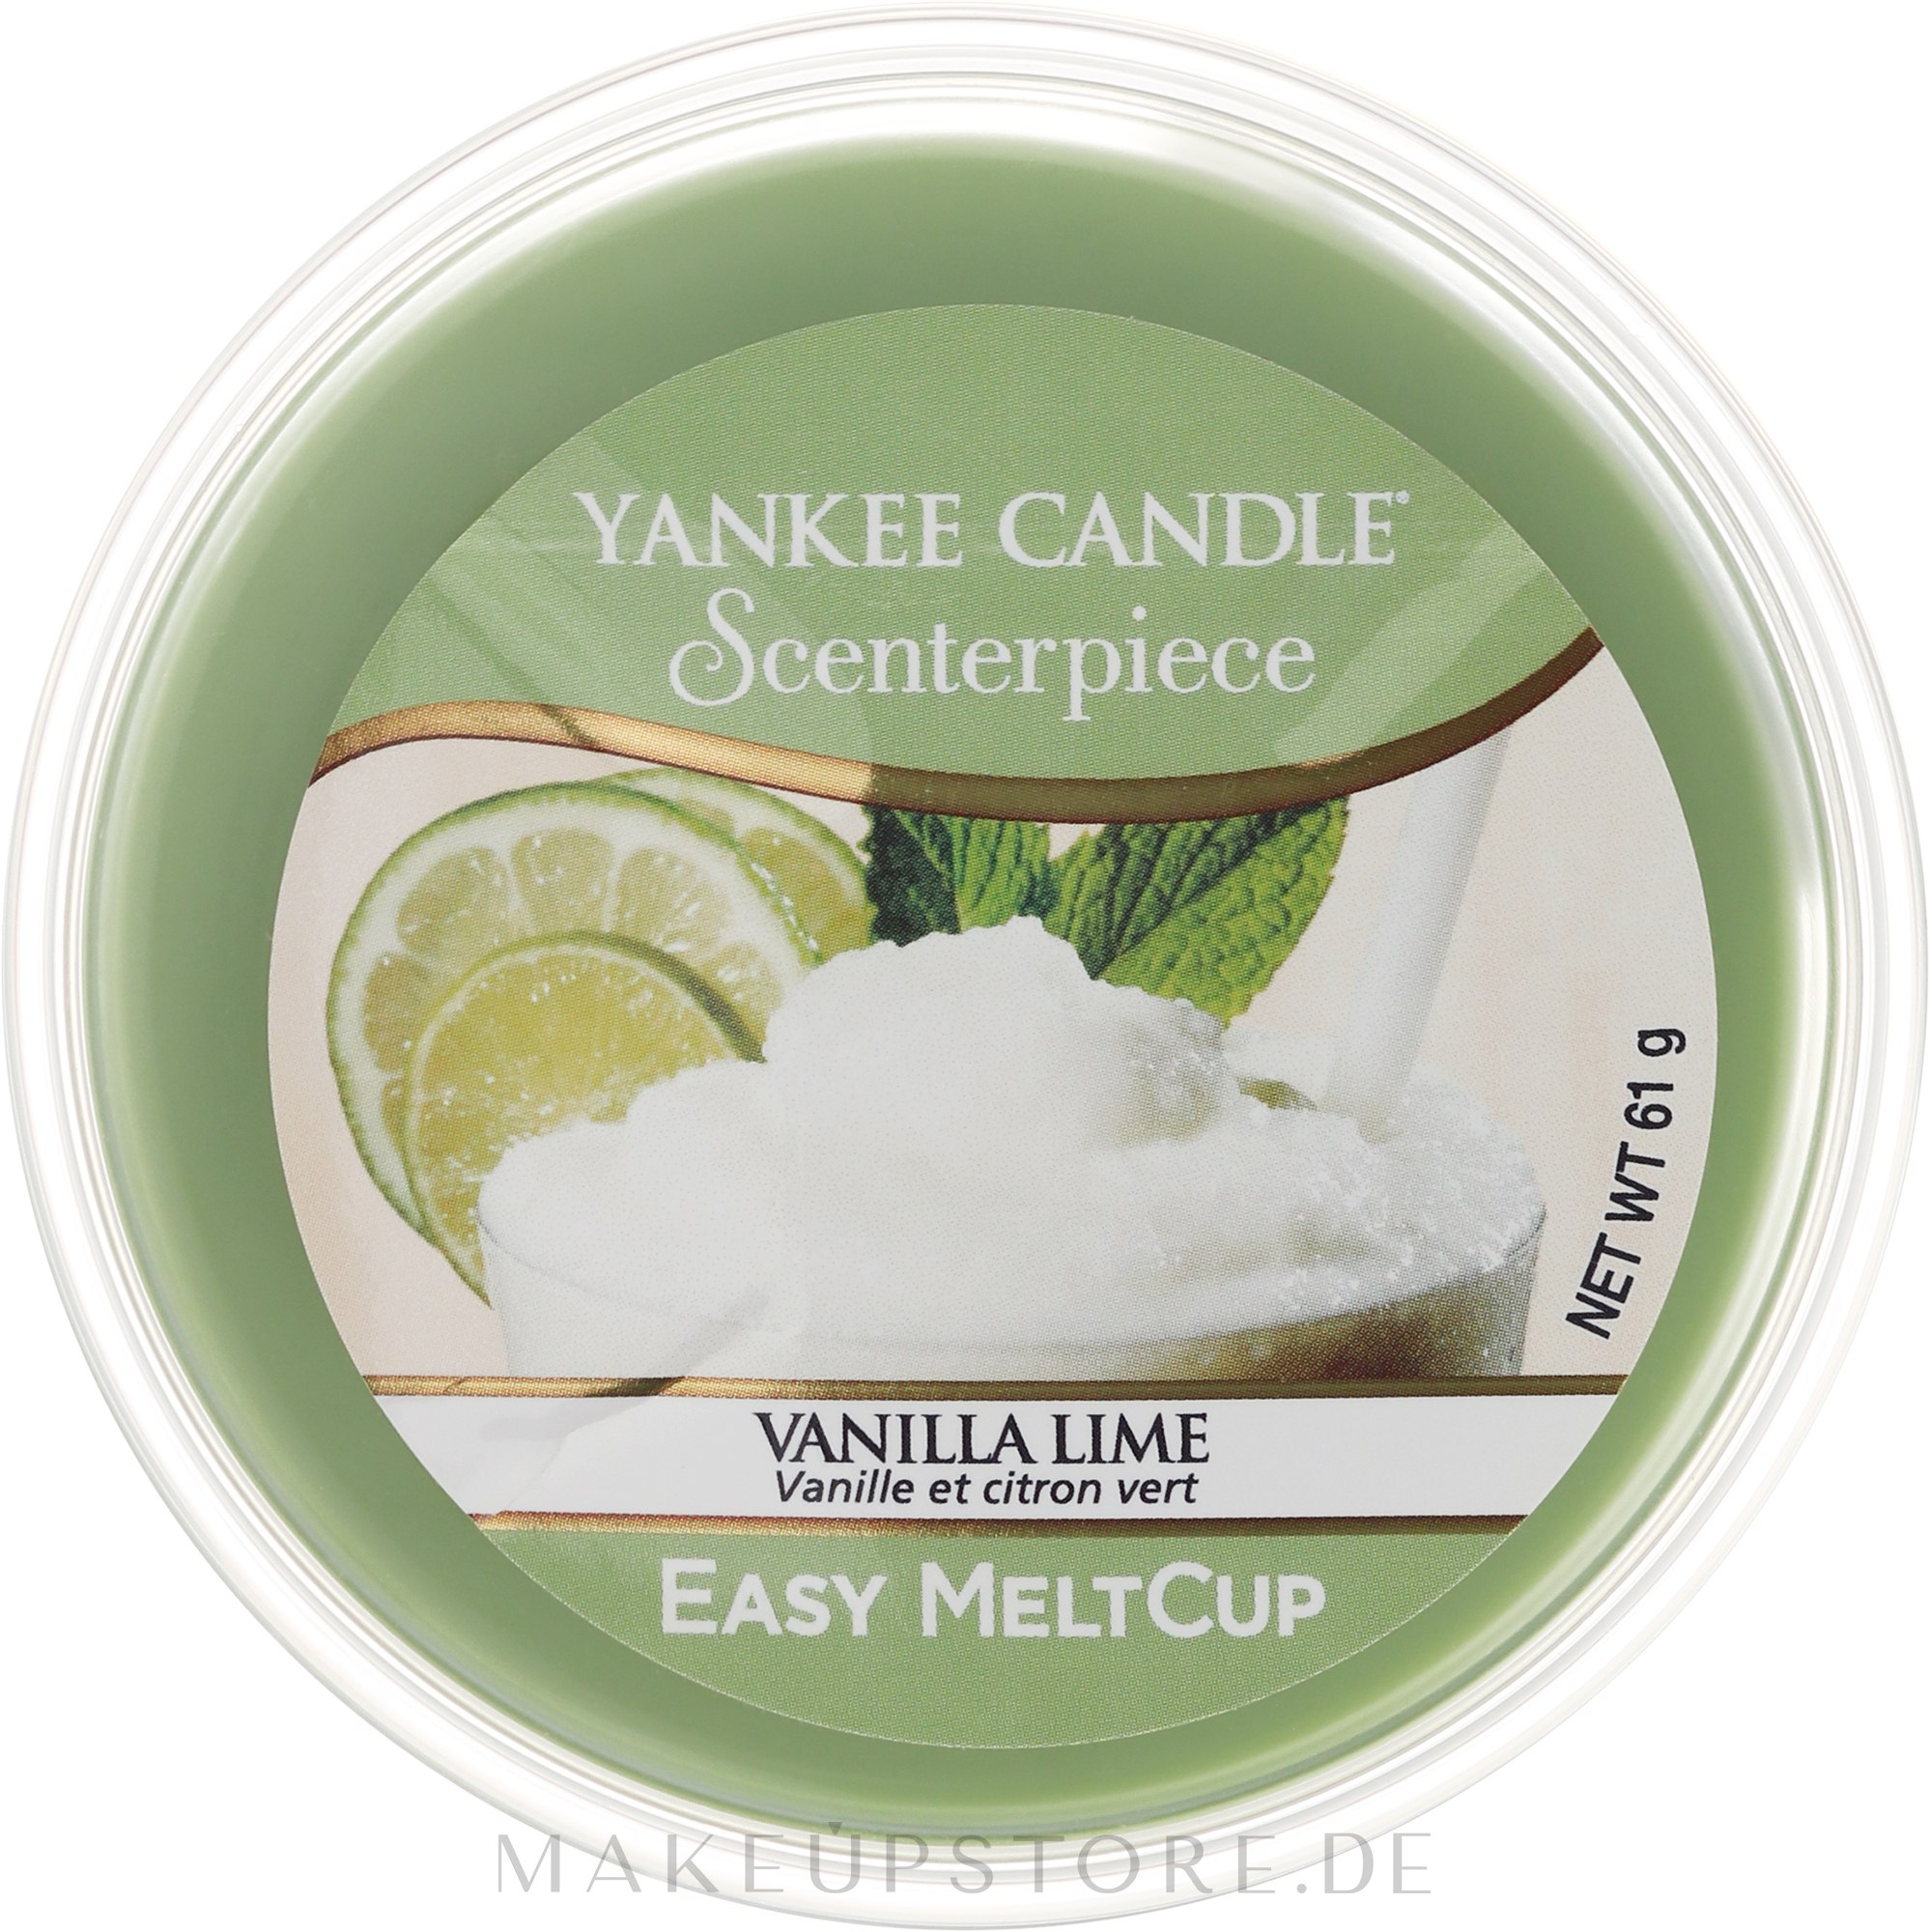 Tart-Duftwachs Vanilla Lime - Yankee Candle Vanilla Lime Melt Cup — Bild 61 g